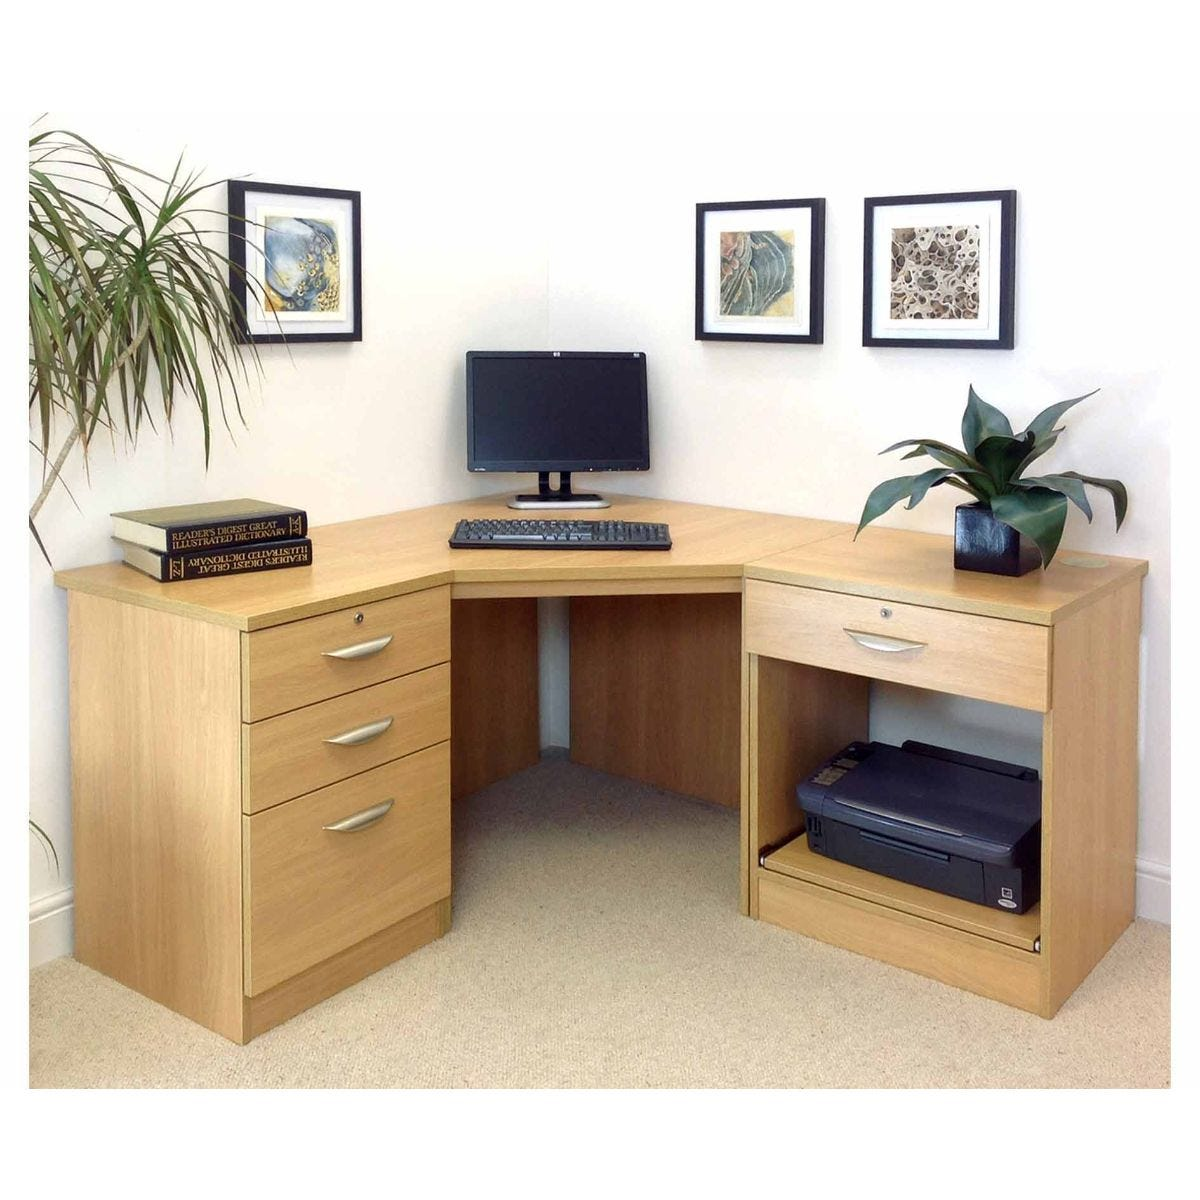 R White Home Office Corner Desk, Classic Oak Wood Grain